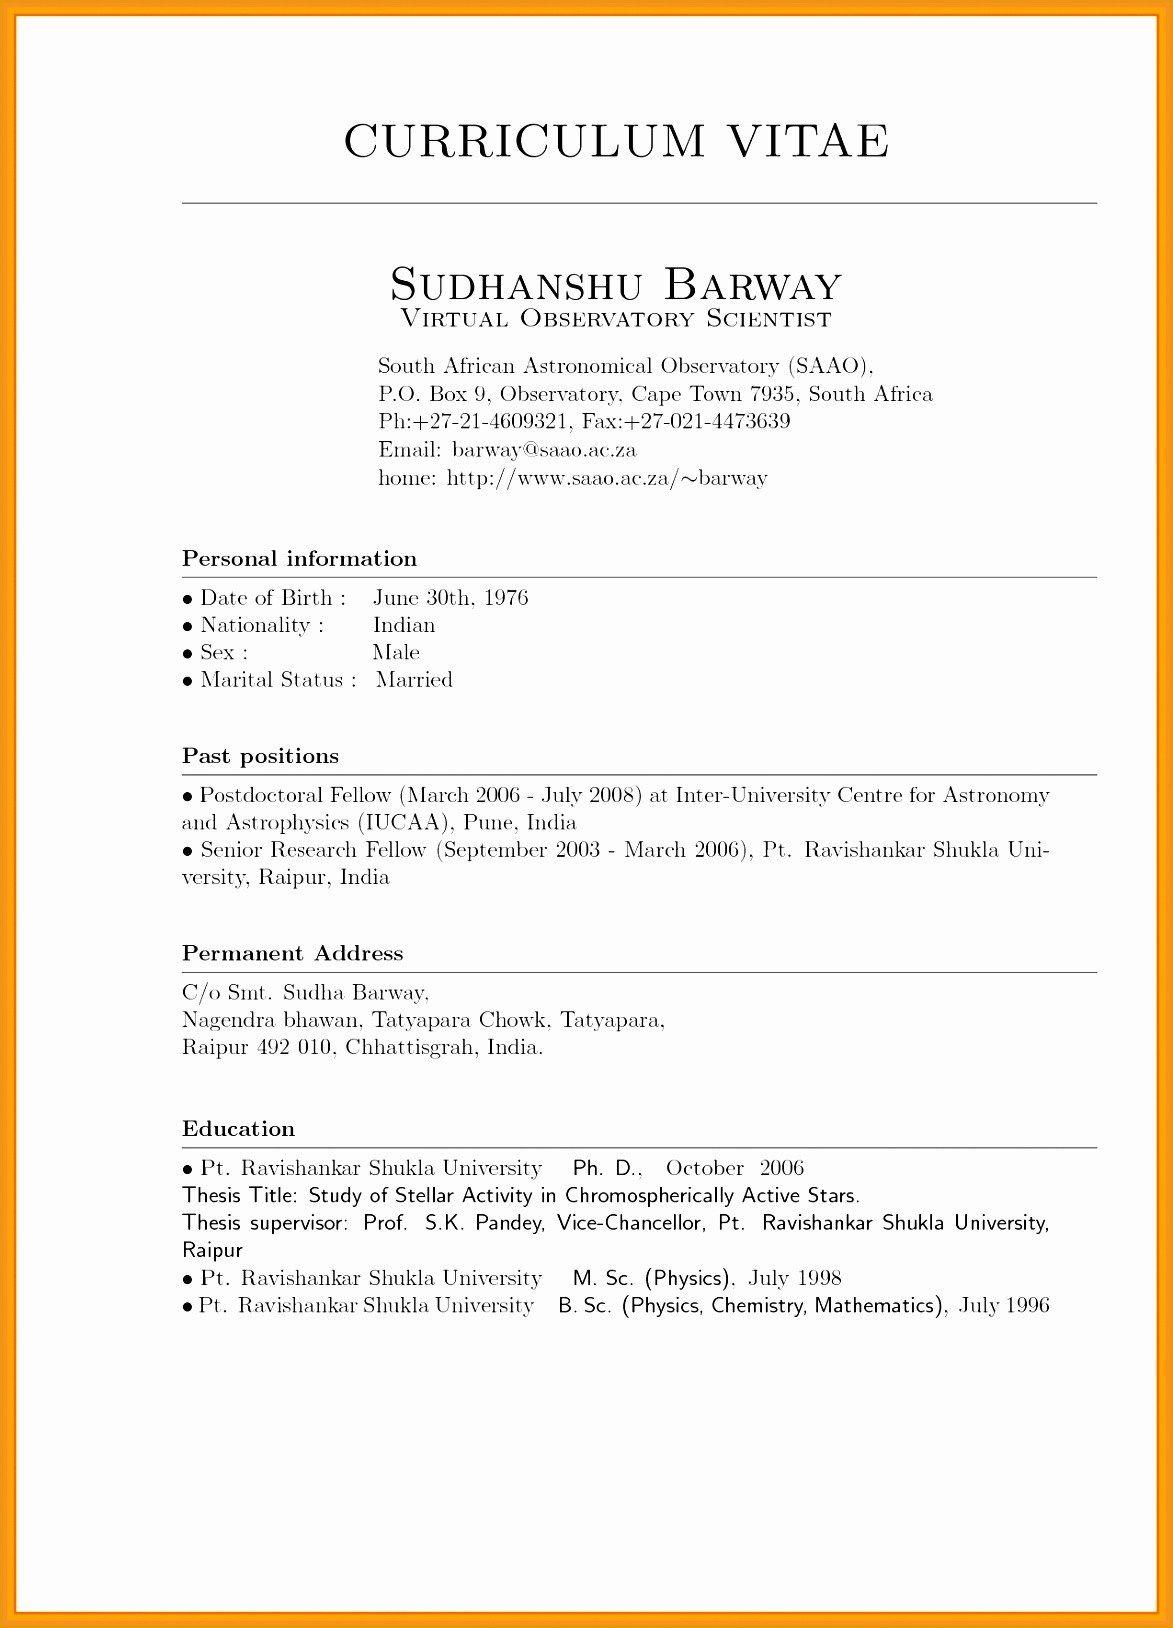 Cv Template Za Resume examples, Curriculum vitae